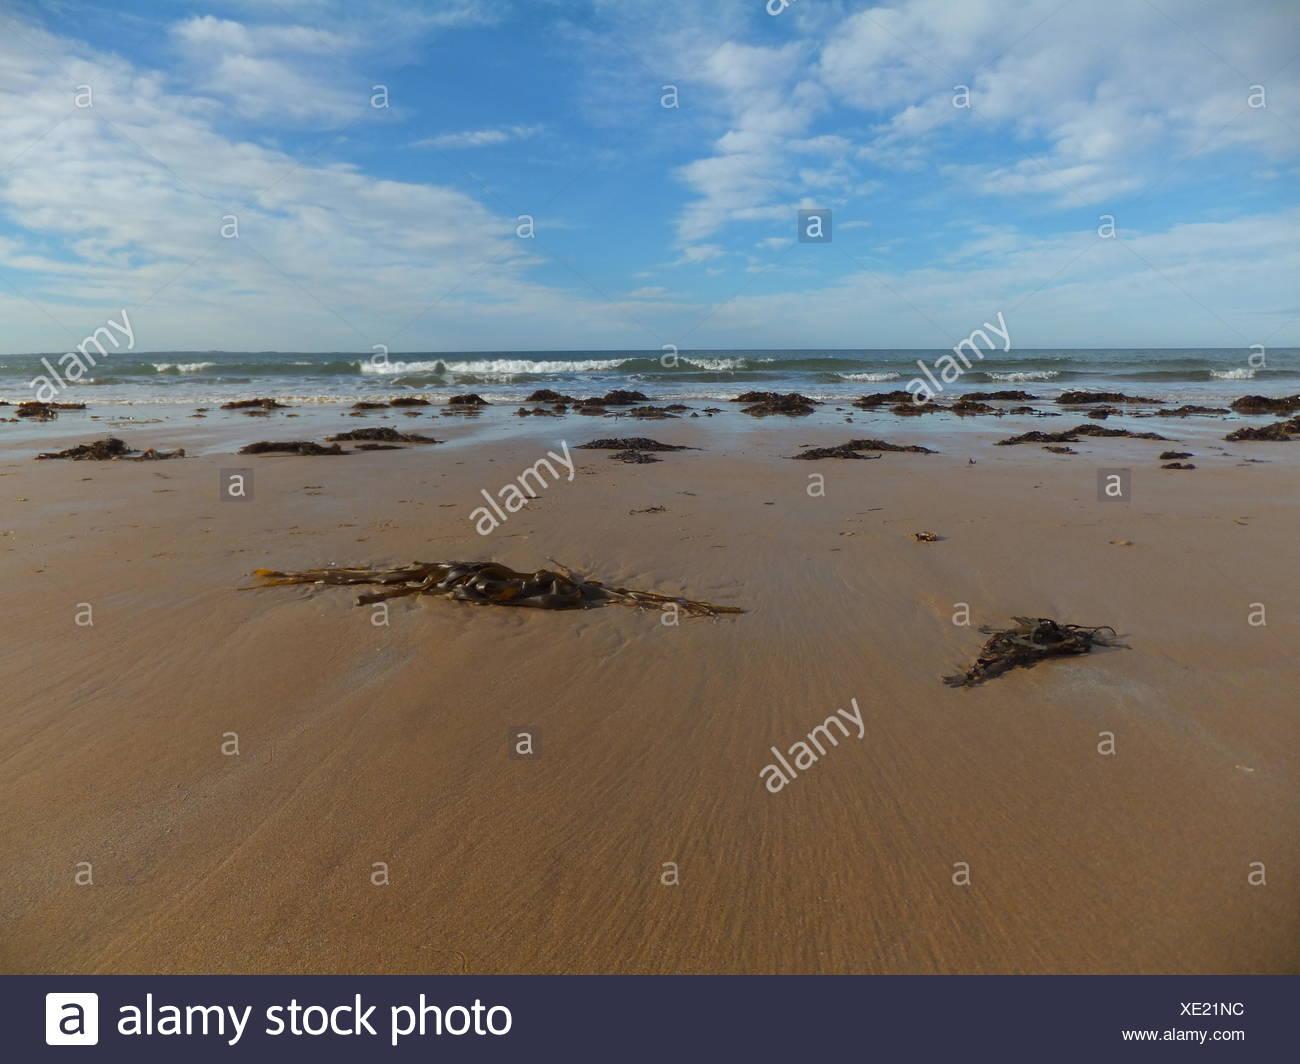 Seaweeds On Beach Against Cloudy Sky - Stock Image